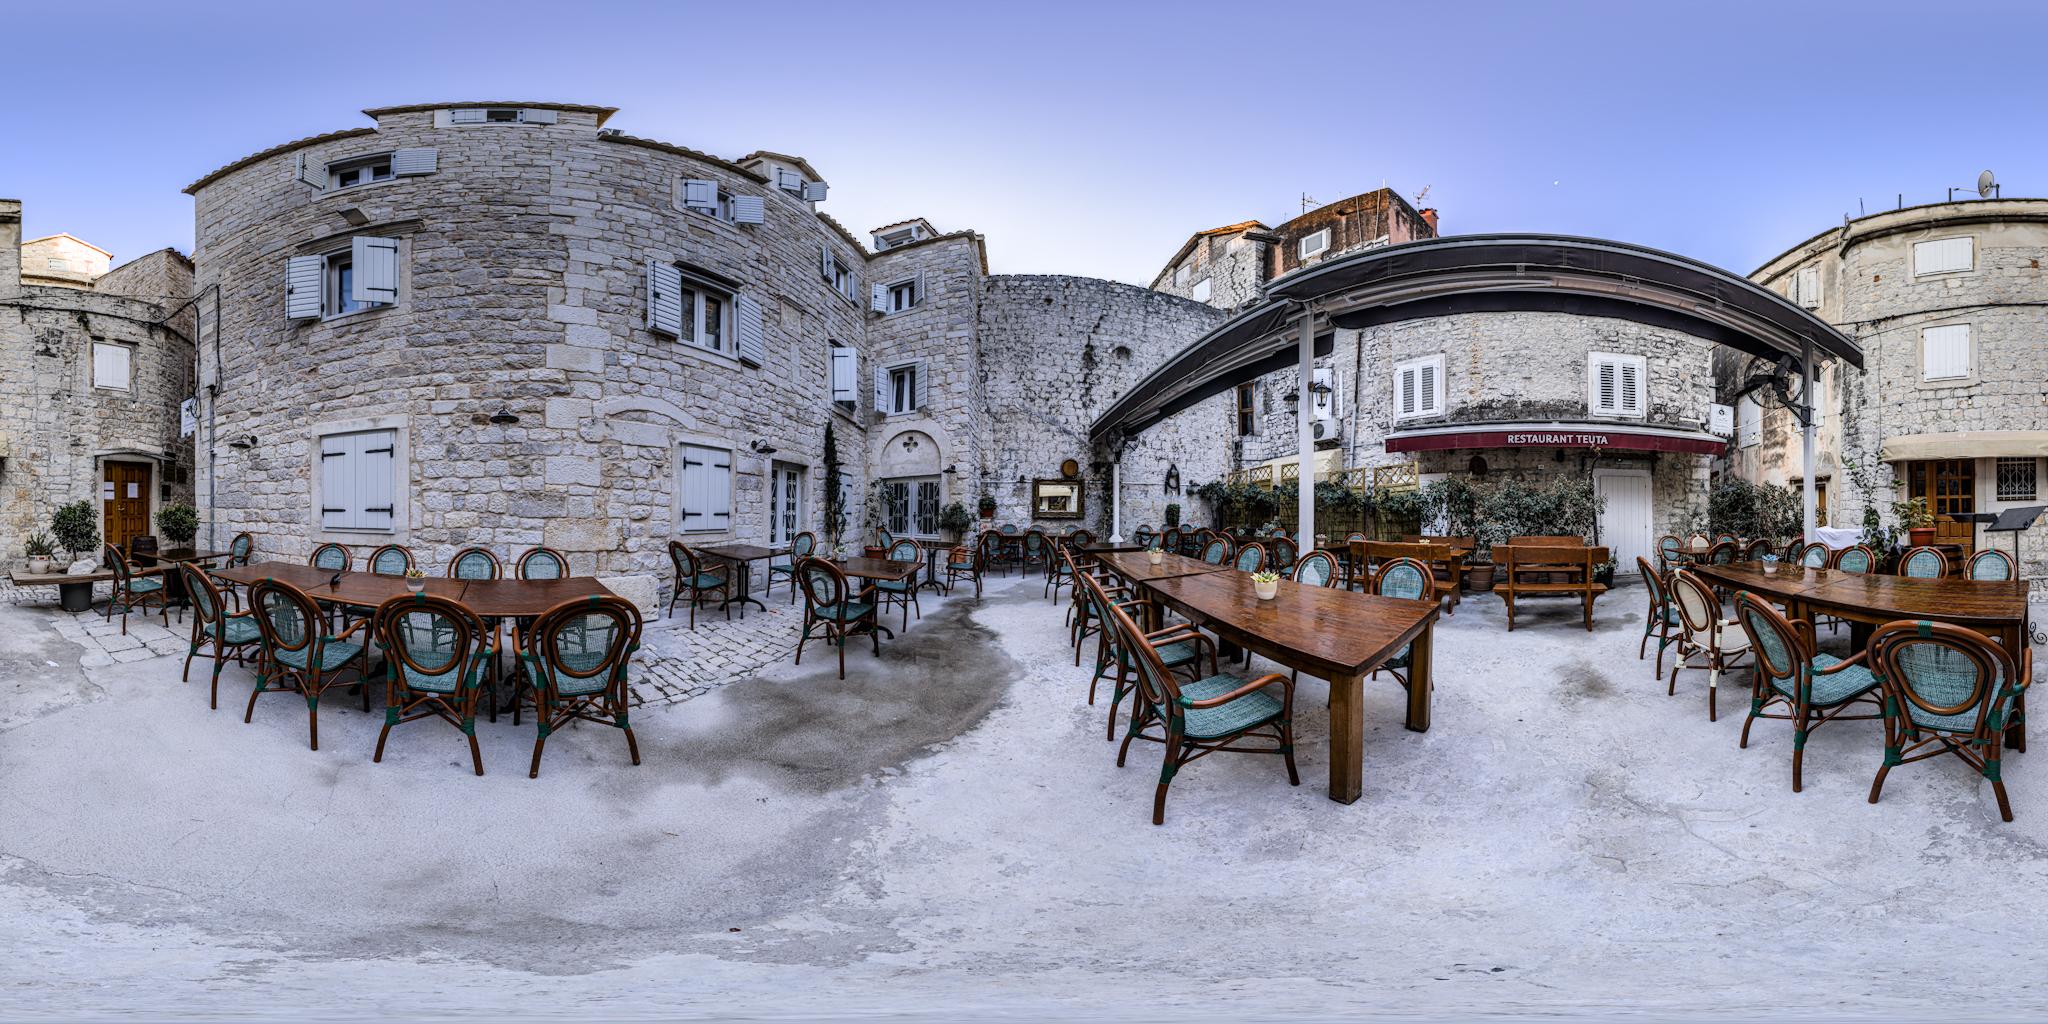 HDRI-Skies-Restaurant-Teuta-Trogir